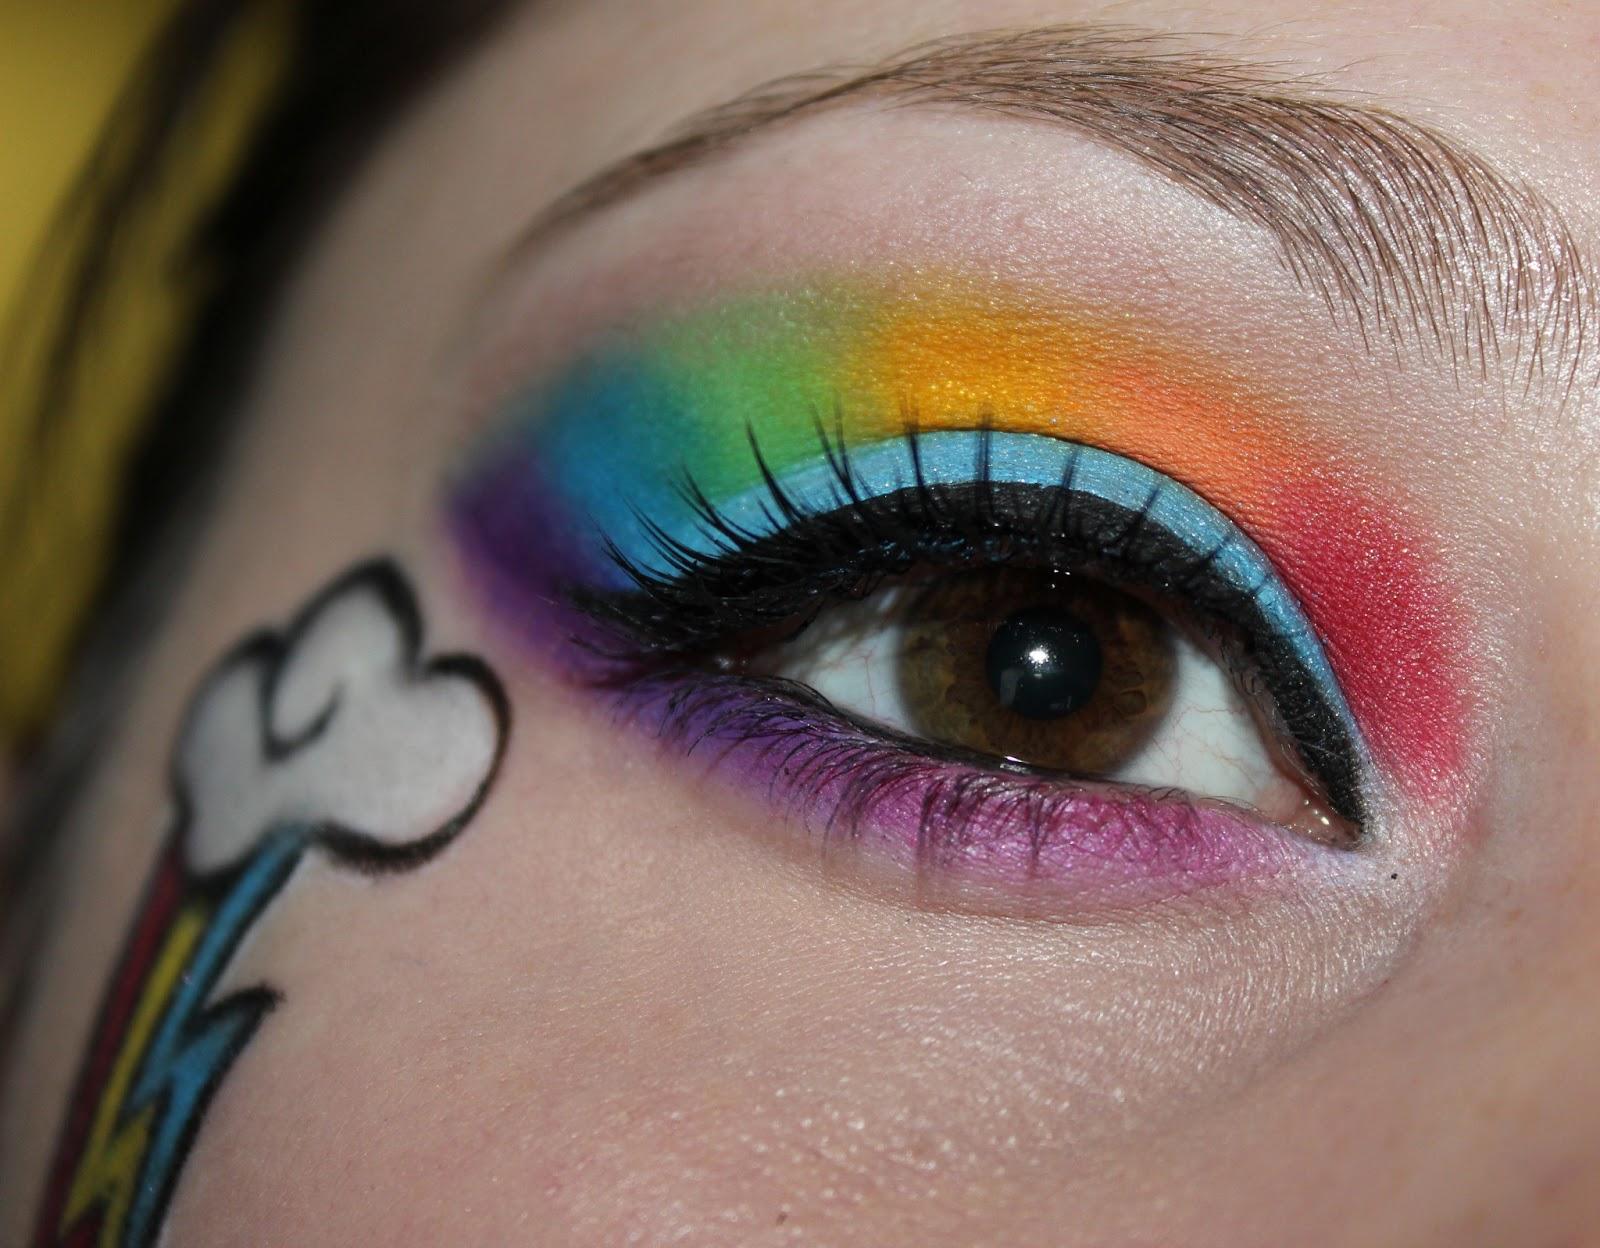 ... Rainbow Dash on Pinterest : Rainbow Dash, My Little Pony and Cosplay